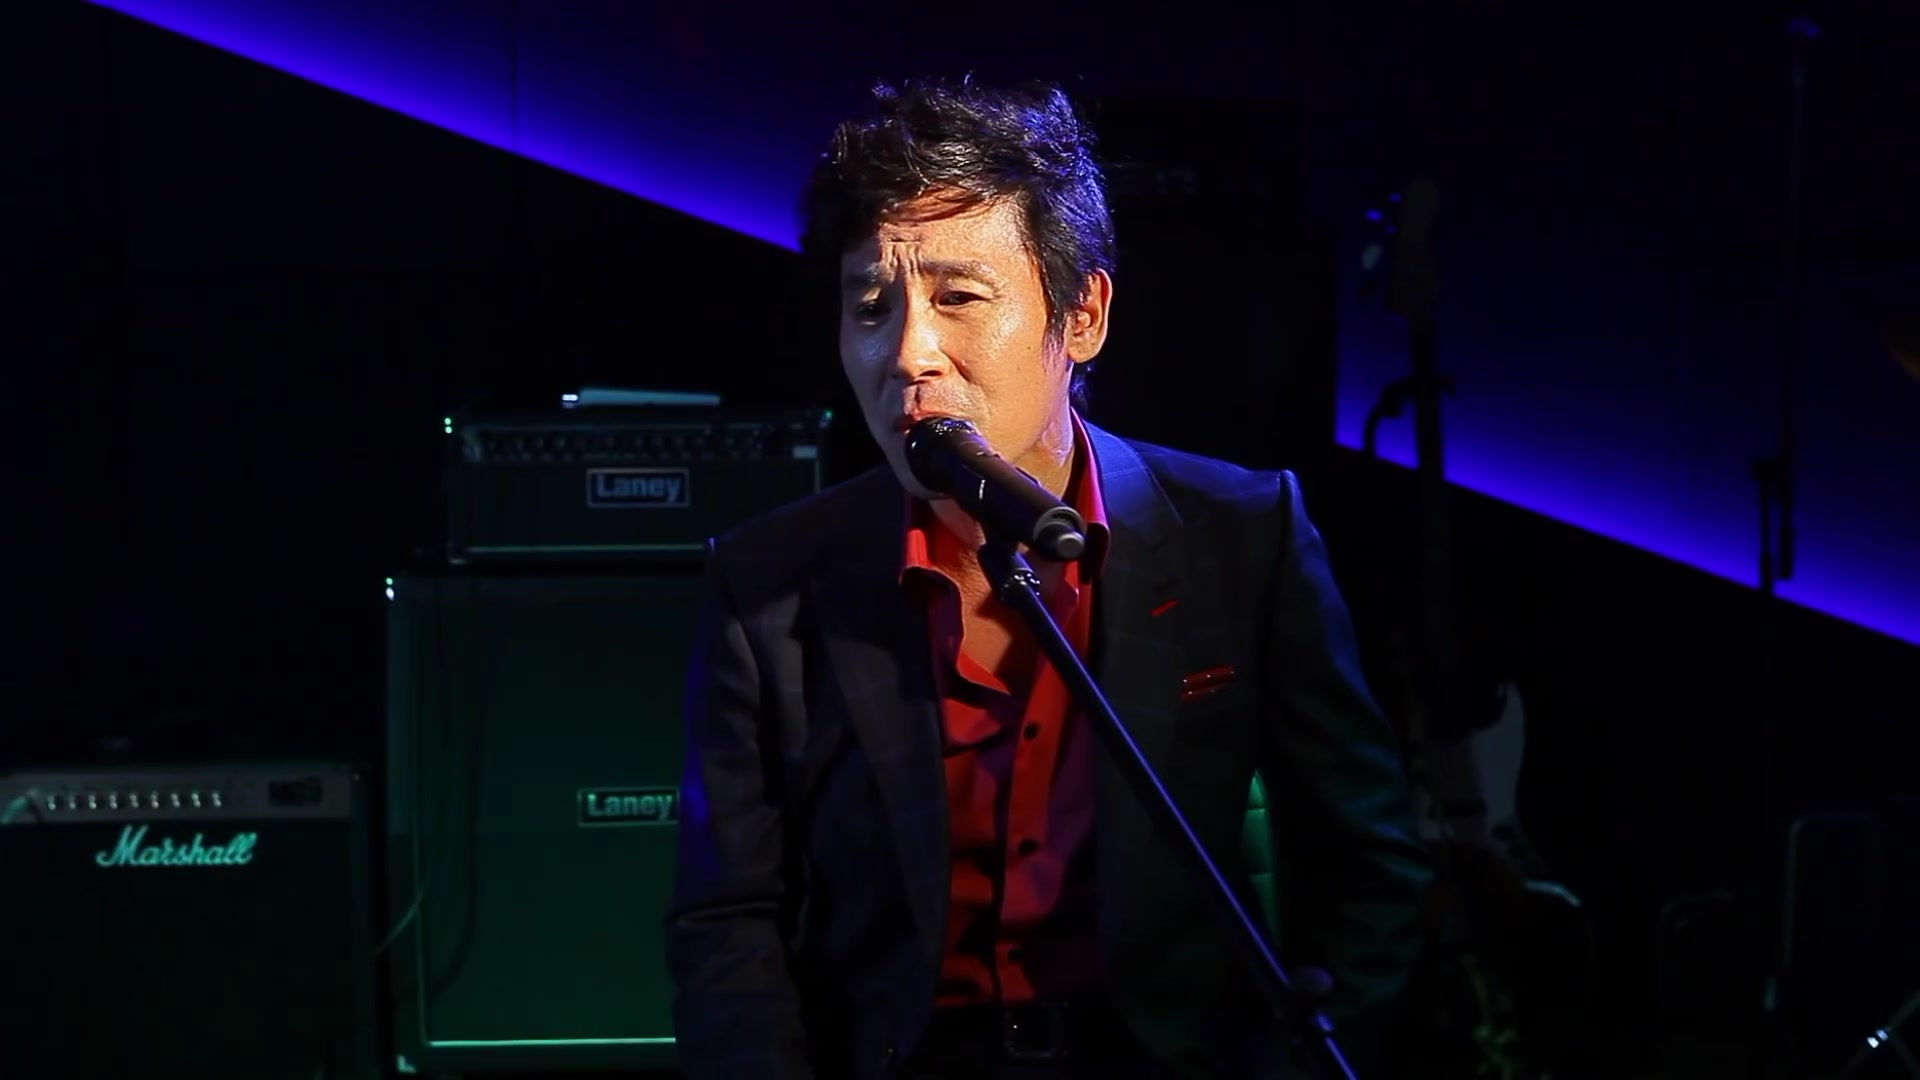 Move On - Jo Kwan Woo